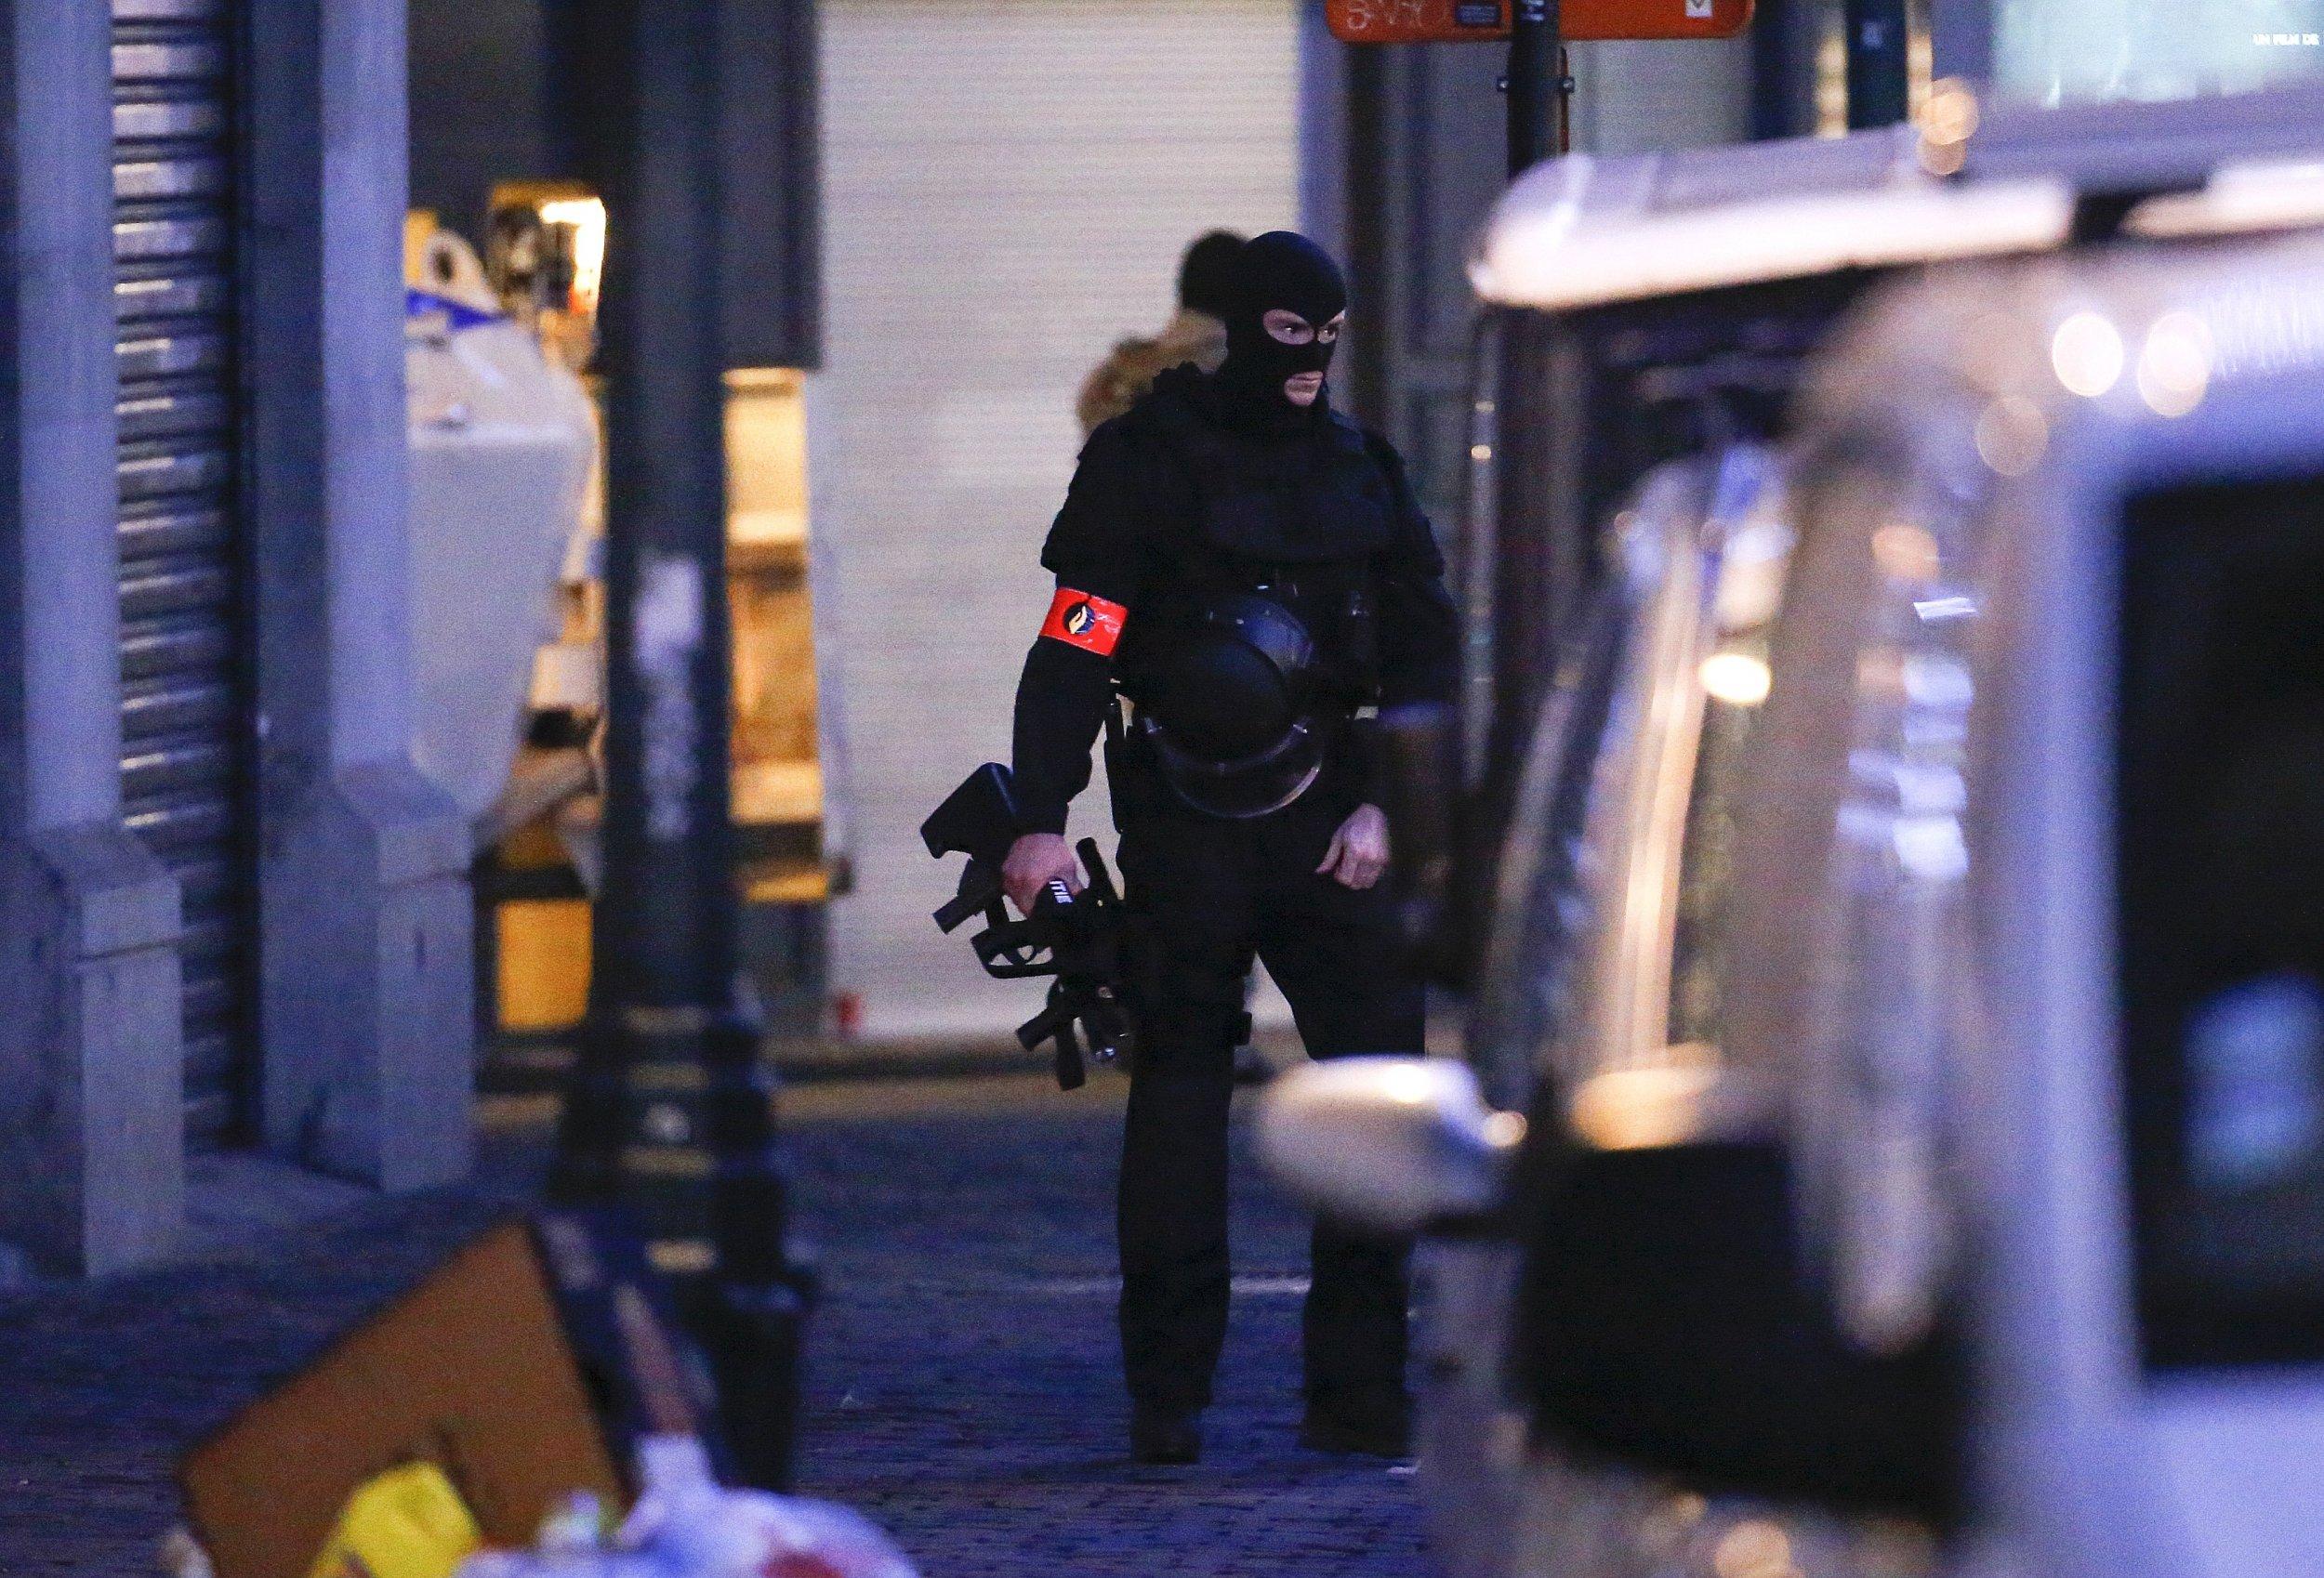 2015-12-20T222732Z_1383040724_GF10000272455_RTRMADP_3_FRANCE-SHOOTING-BELGIUM